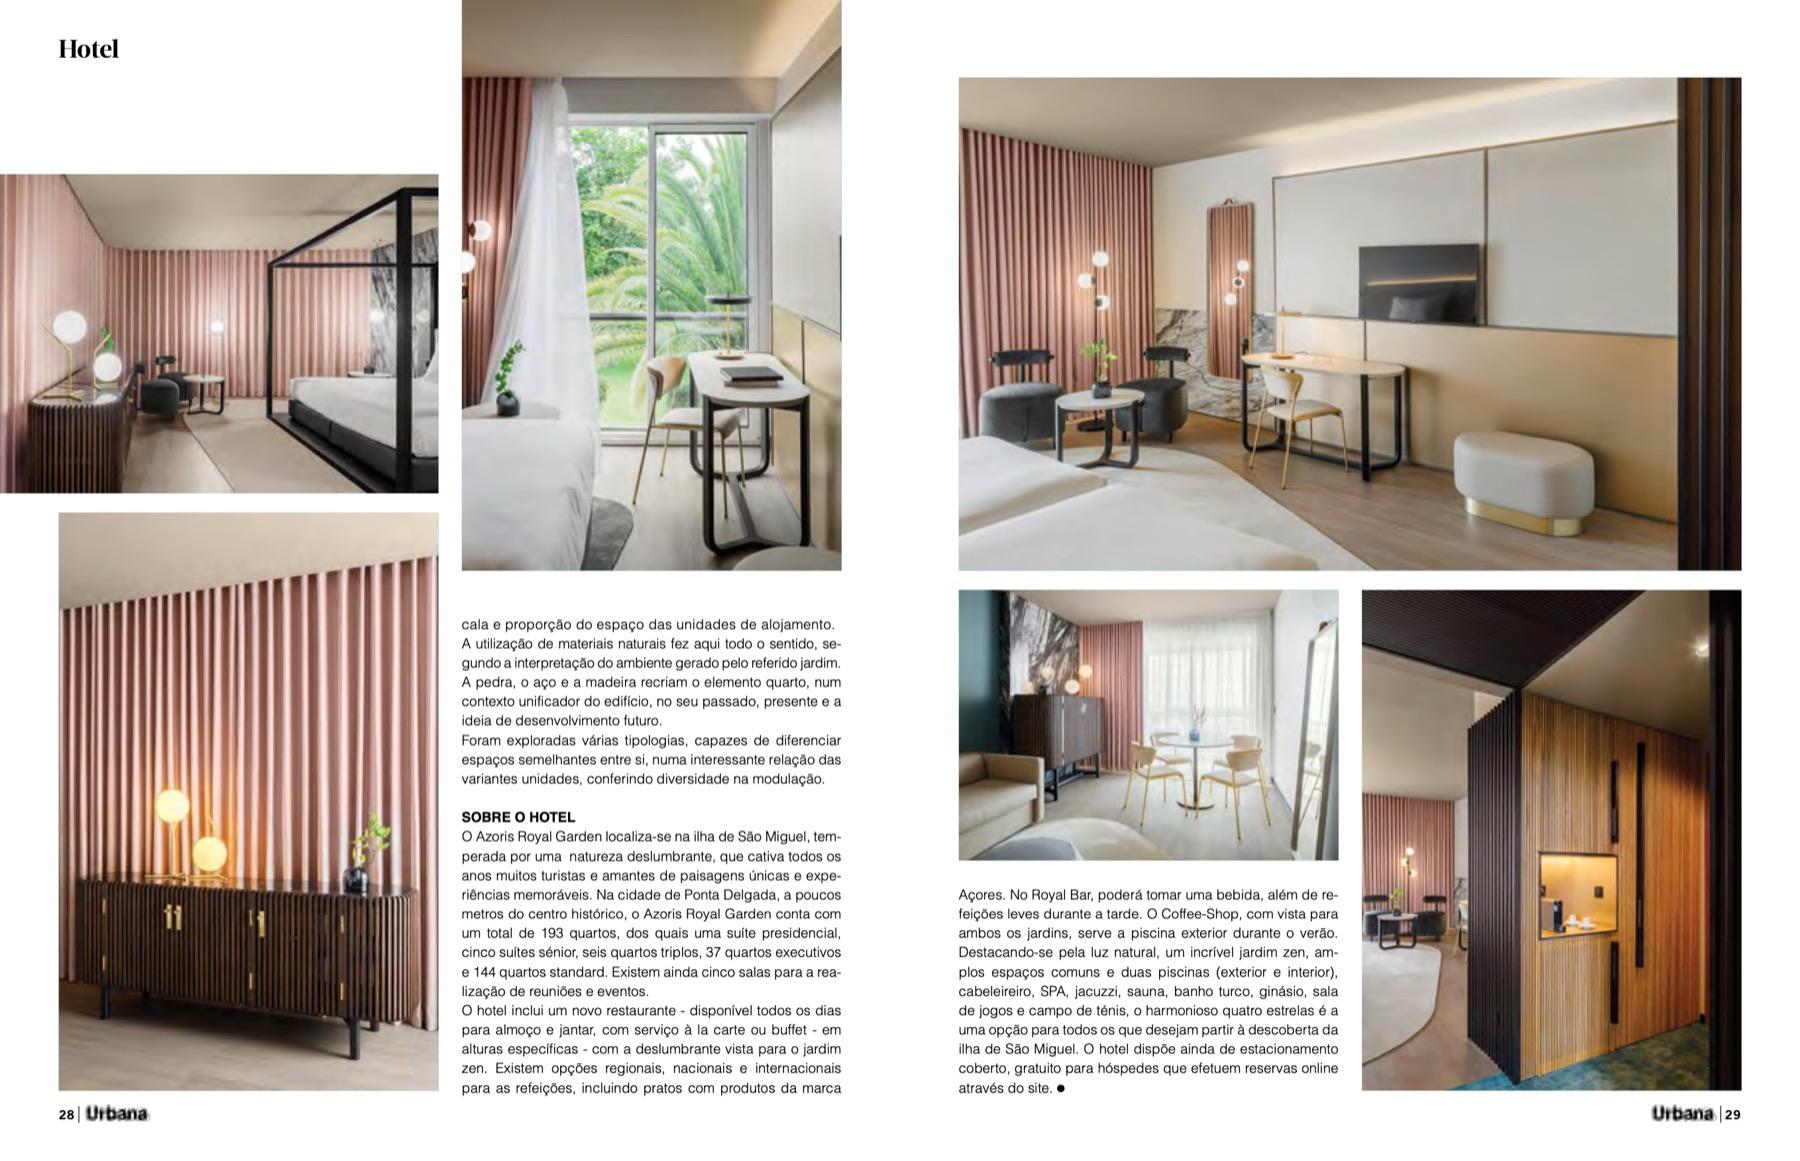 revista urbana 82 box arquitectos azoris hotels 2 2